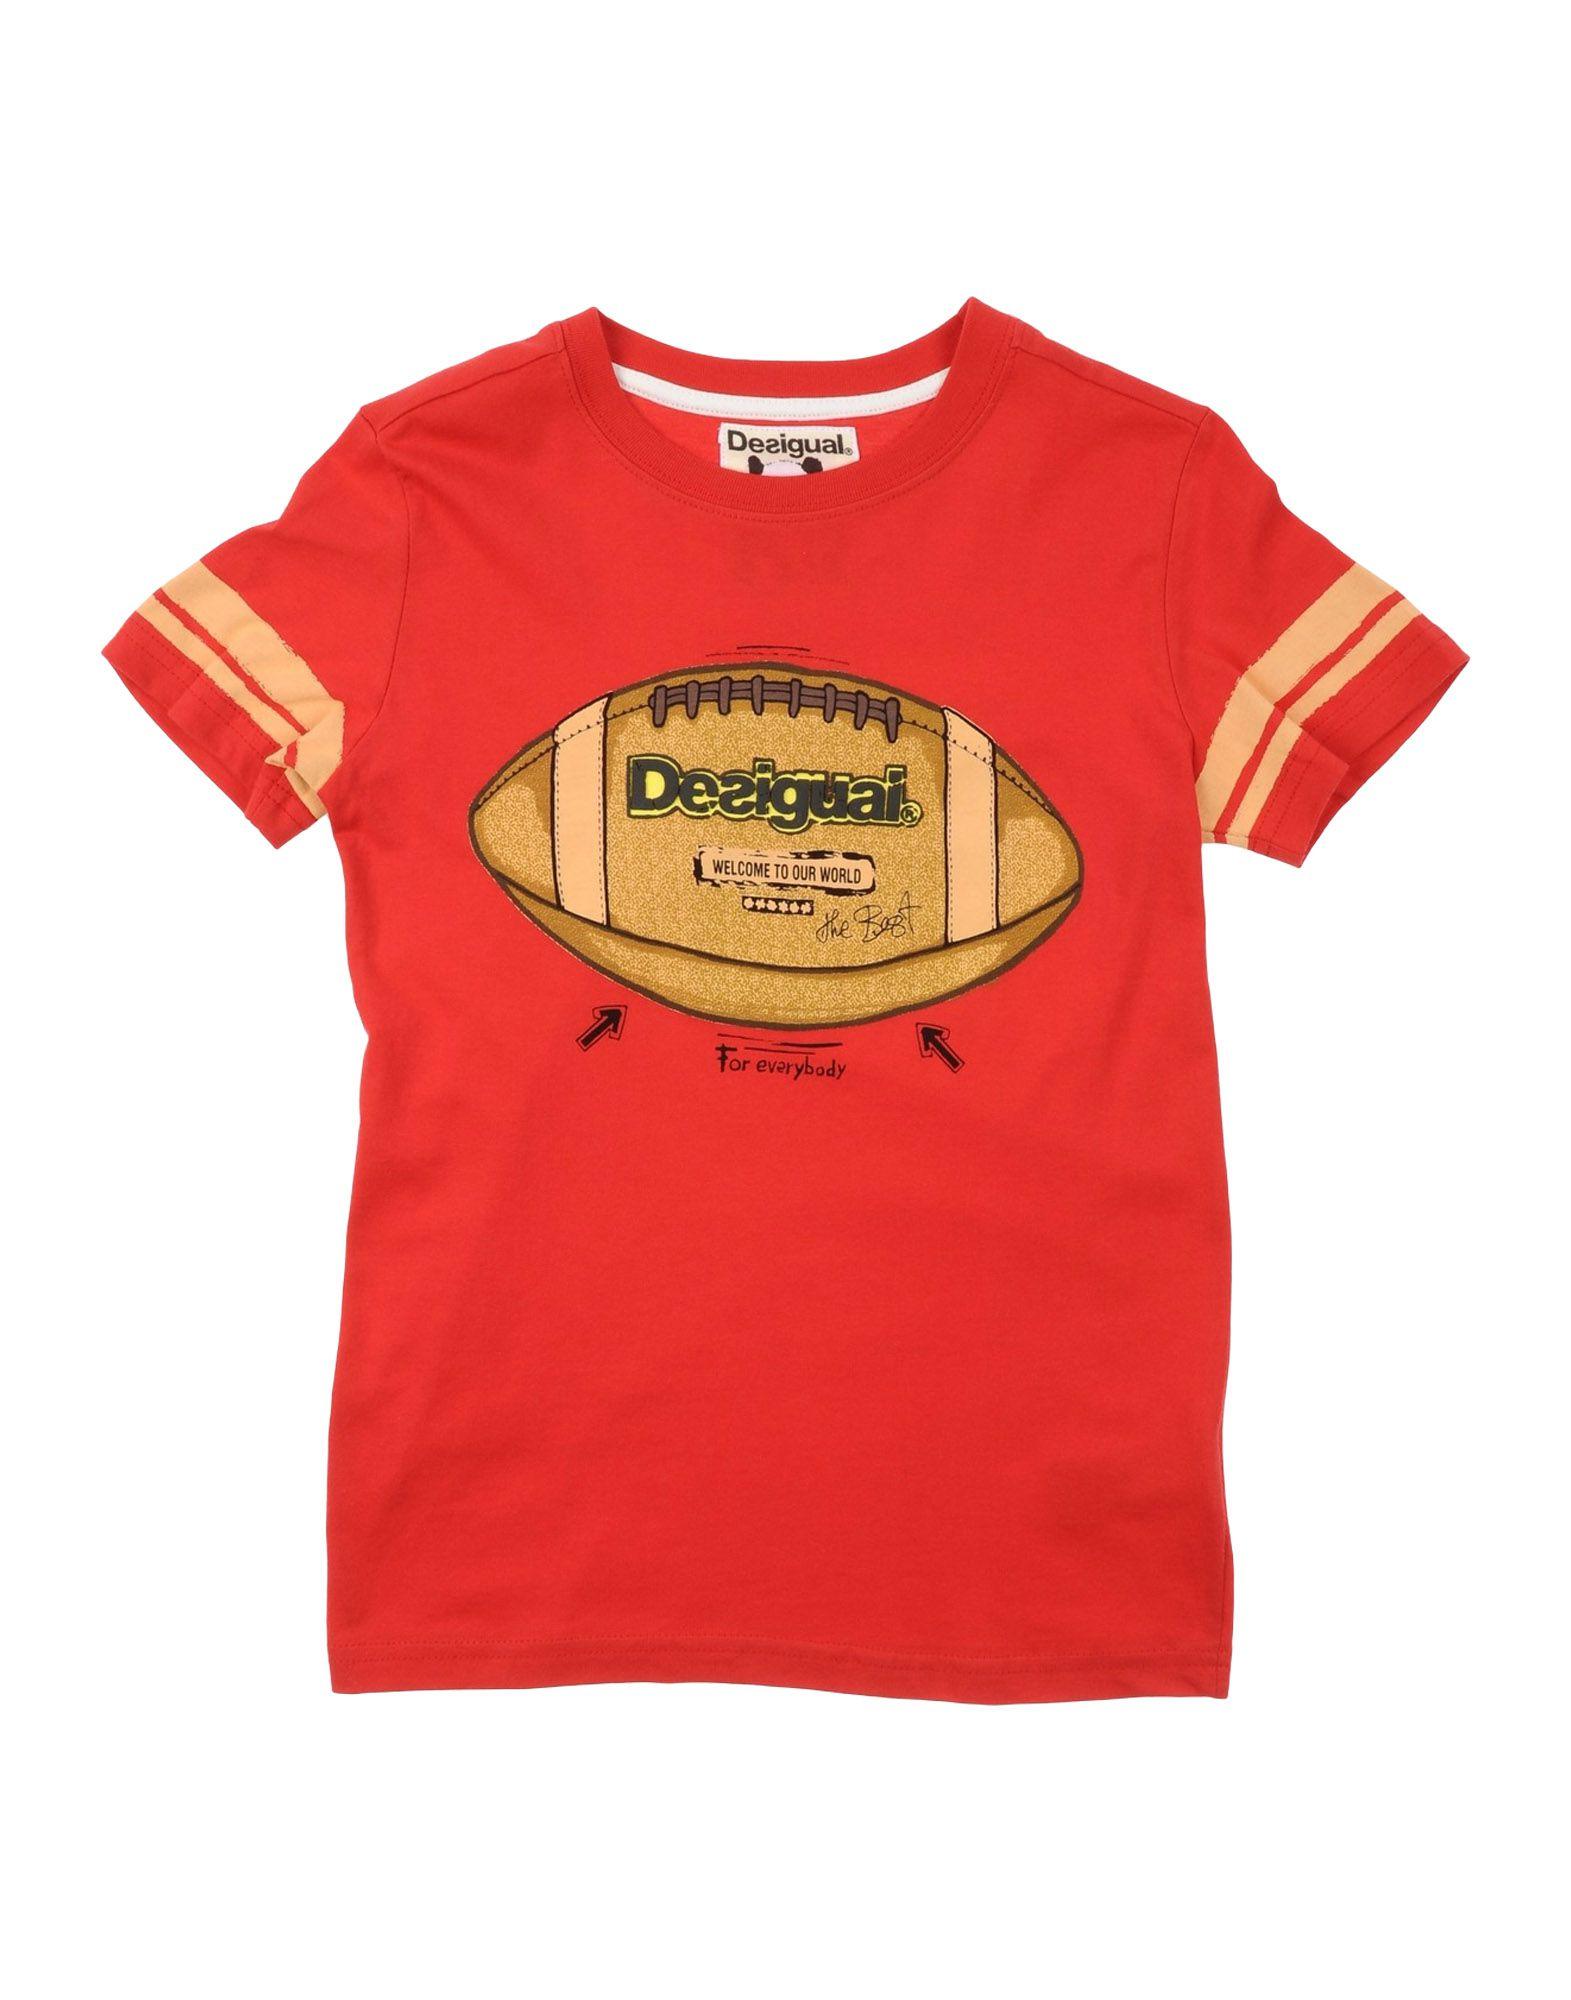 DESIGUAL Tshirts